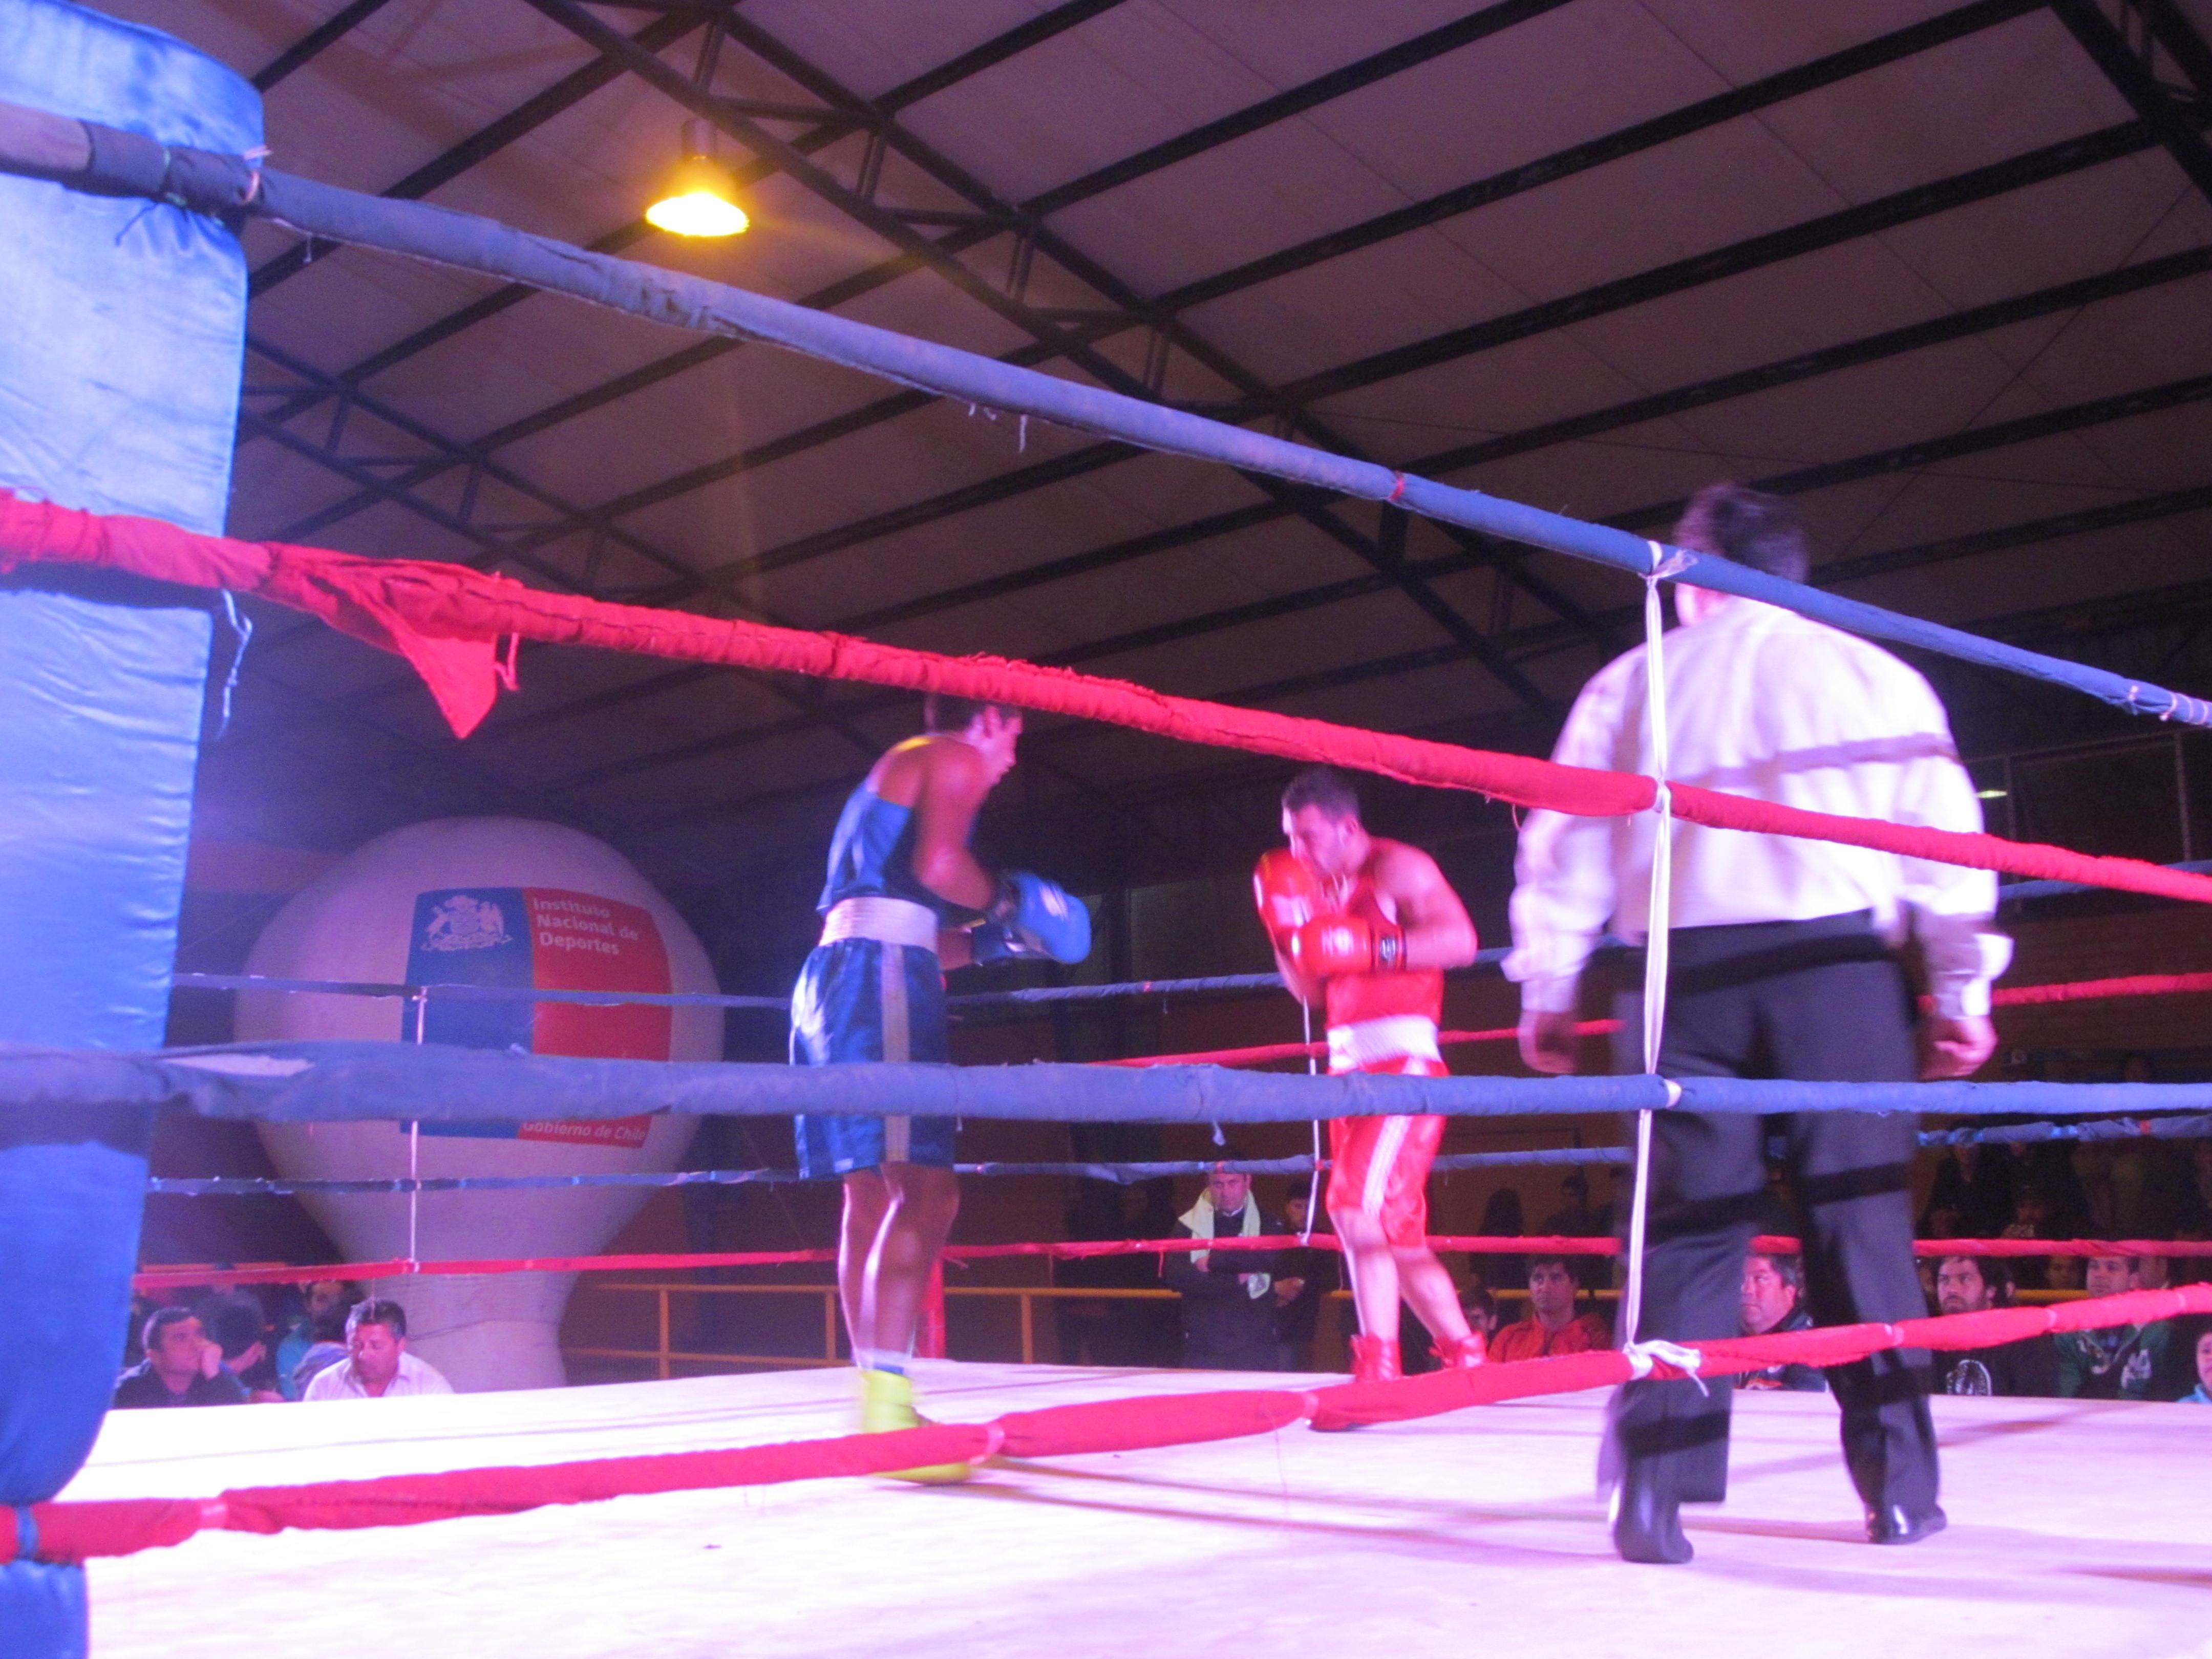 Maule vibró con noche de boxeo